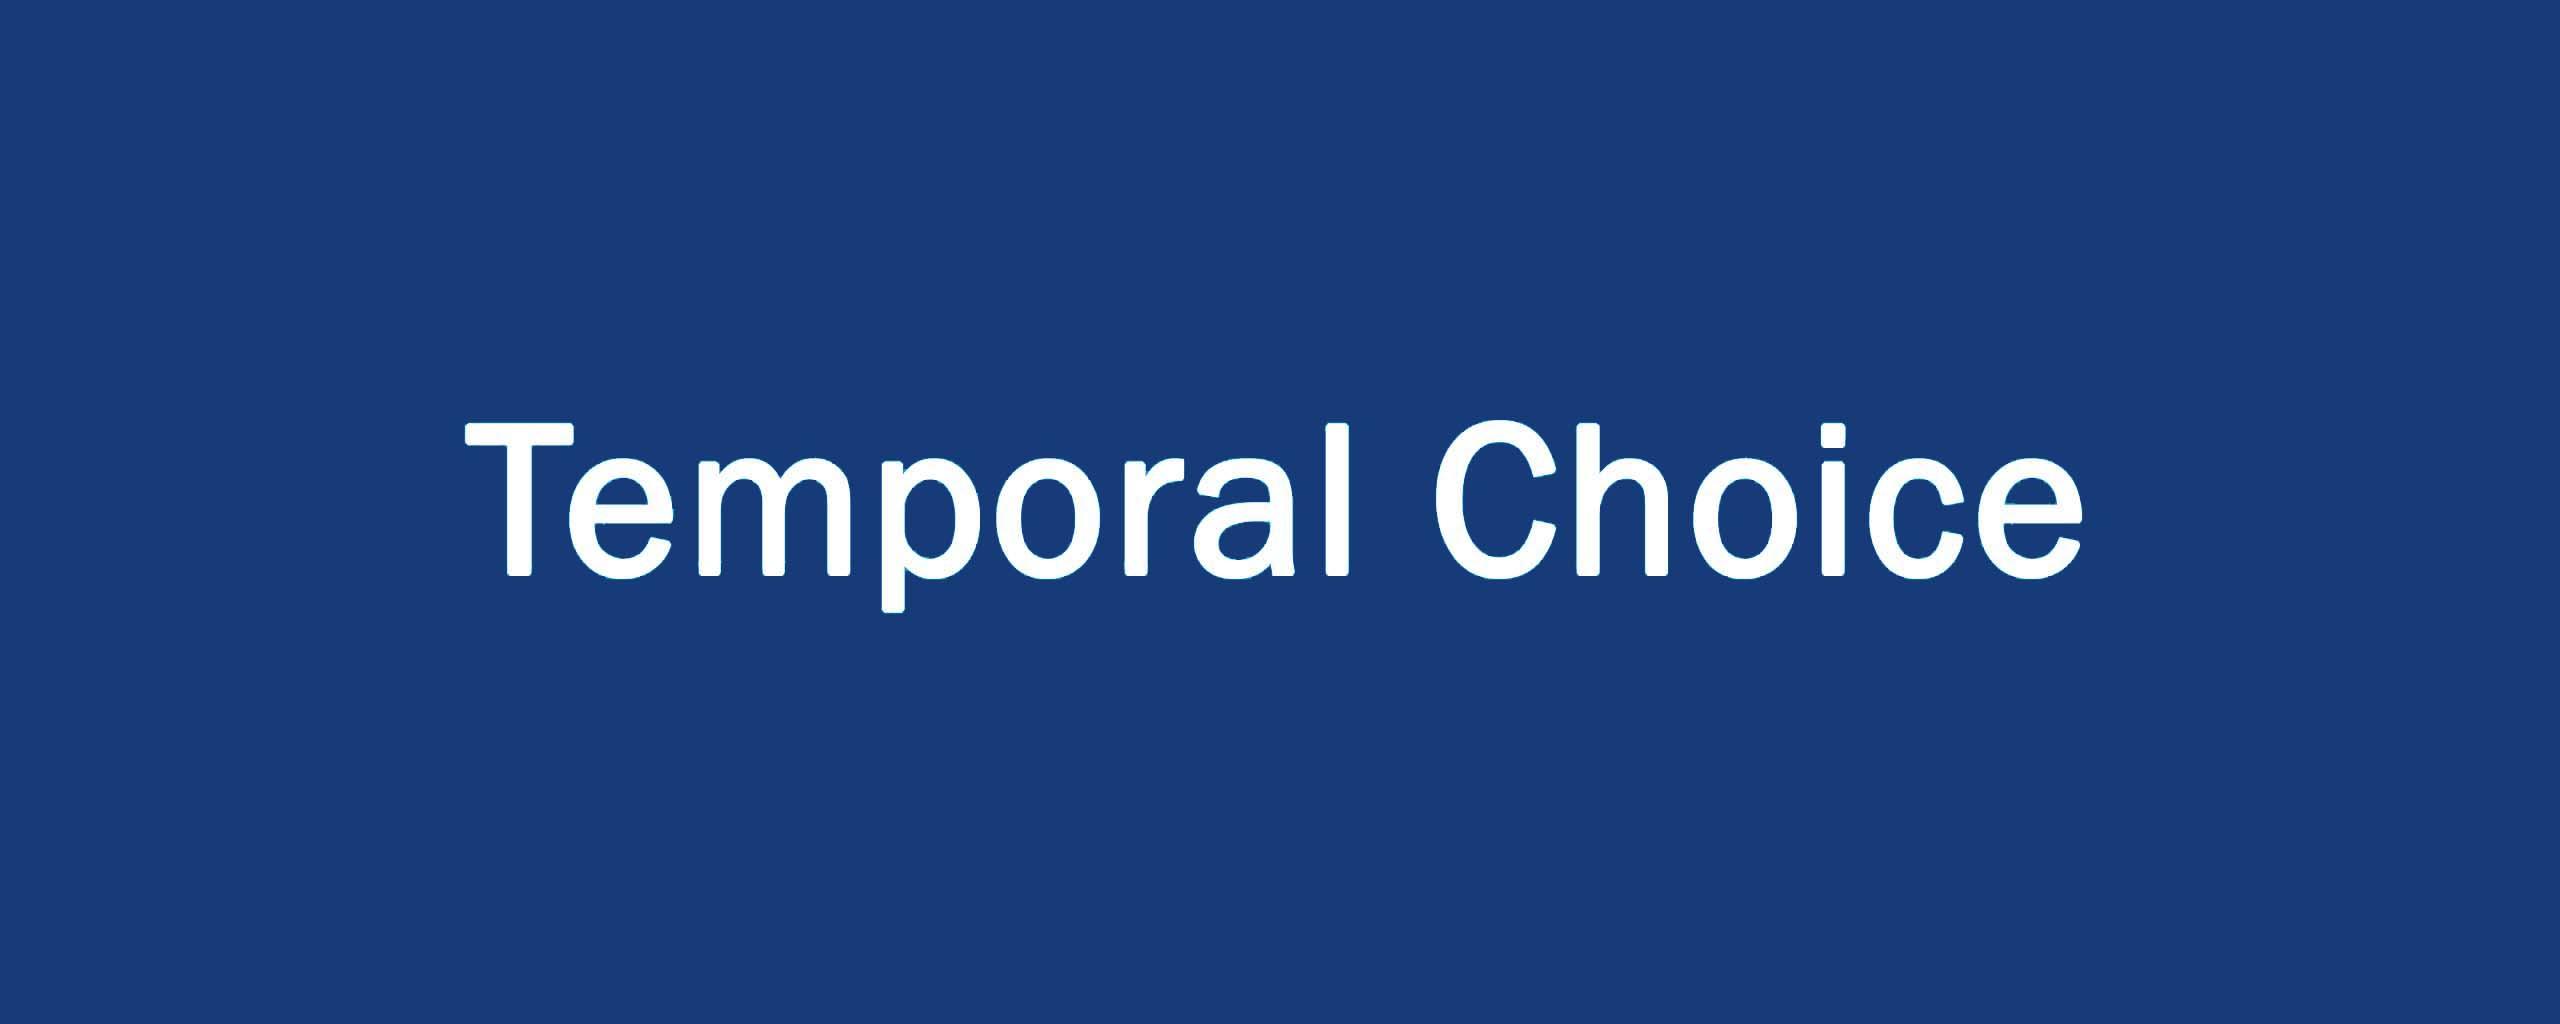 Temporal Choice